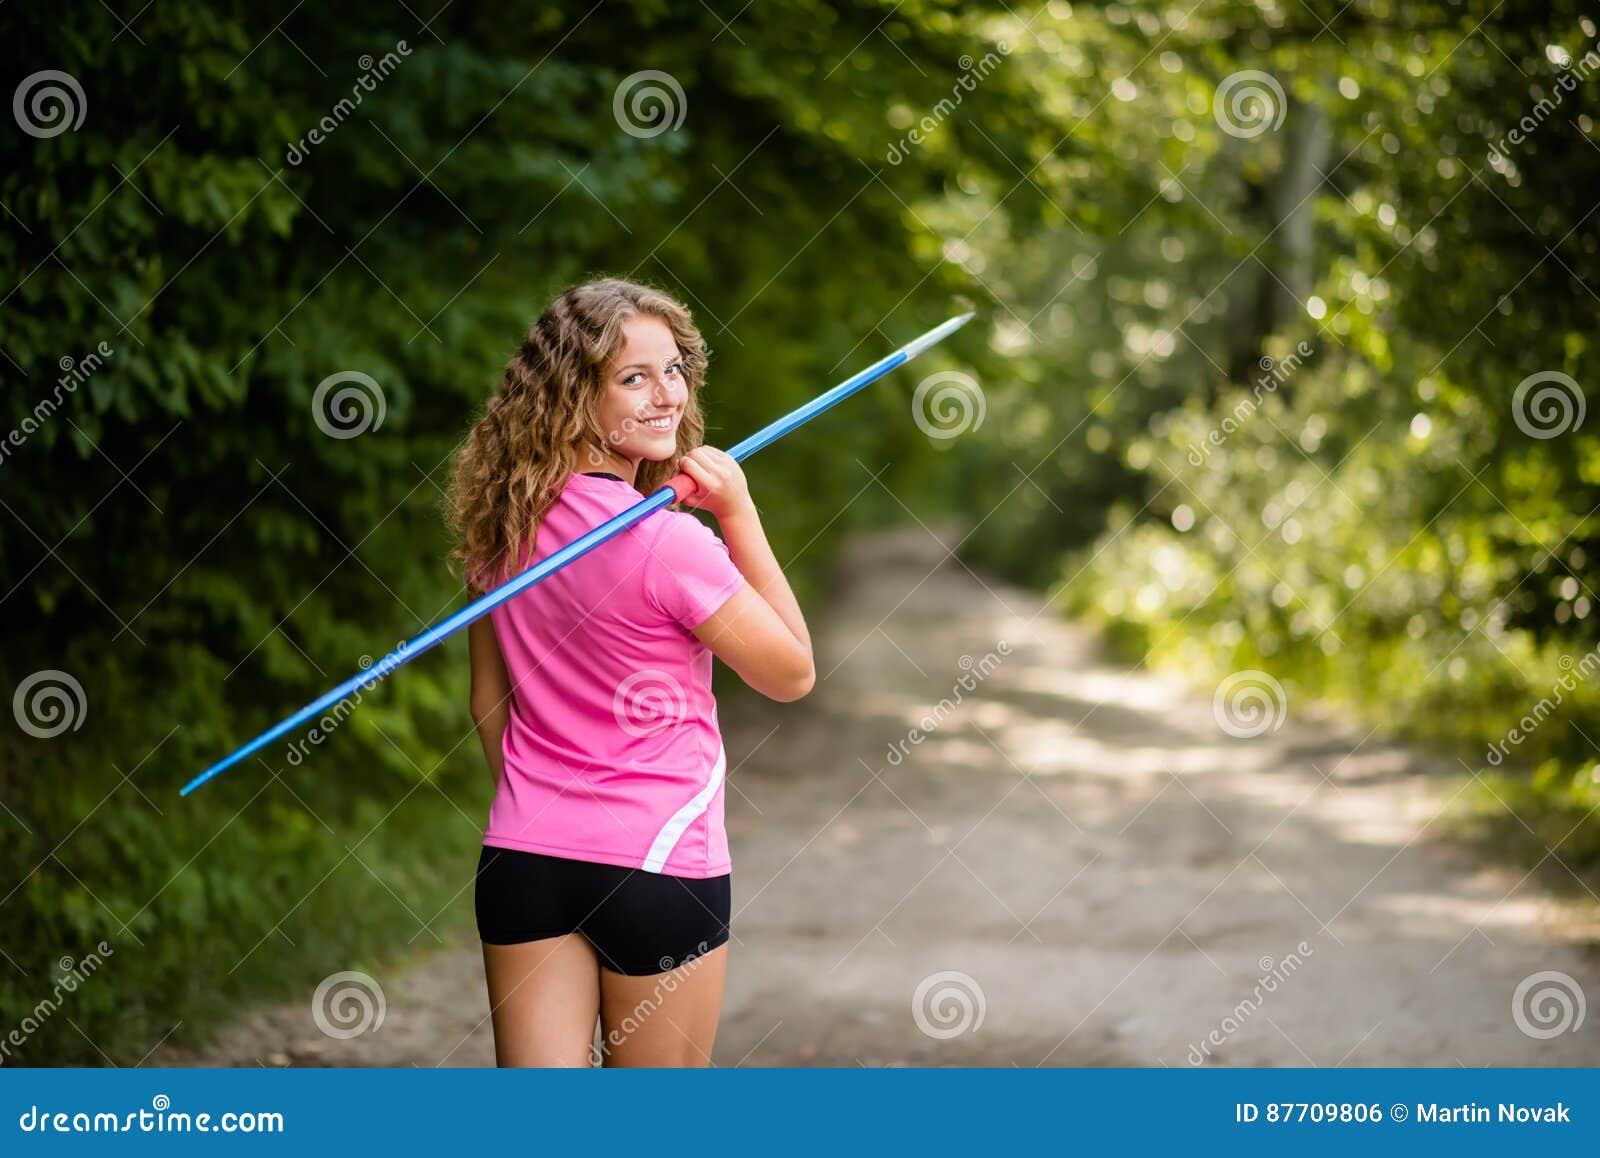 Jeune femme sportive portant un javelot